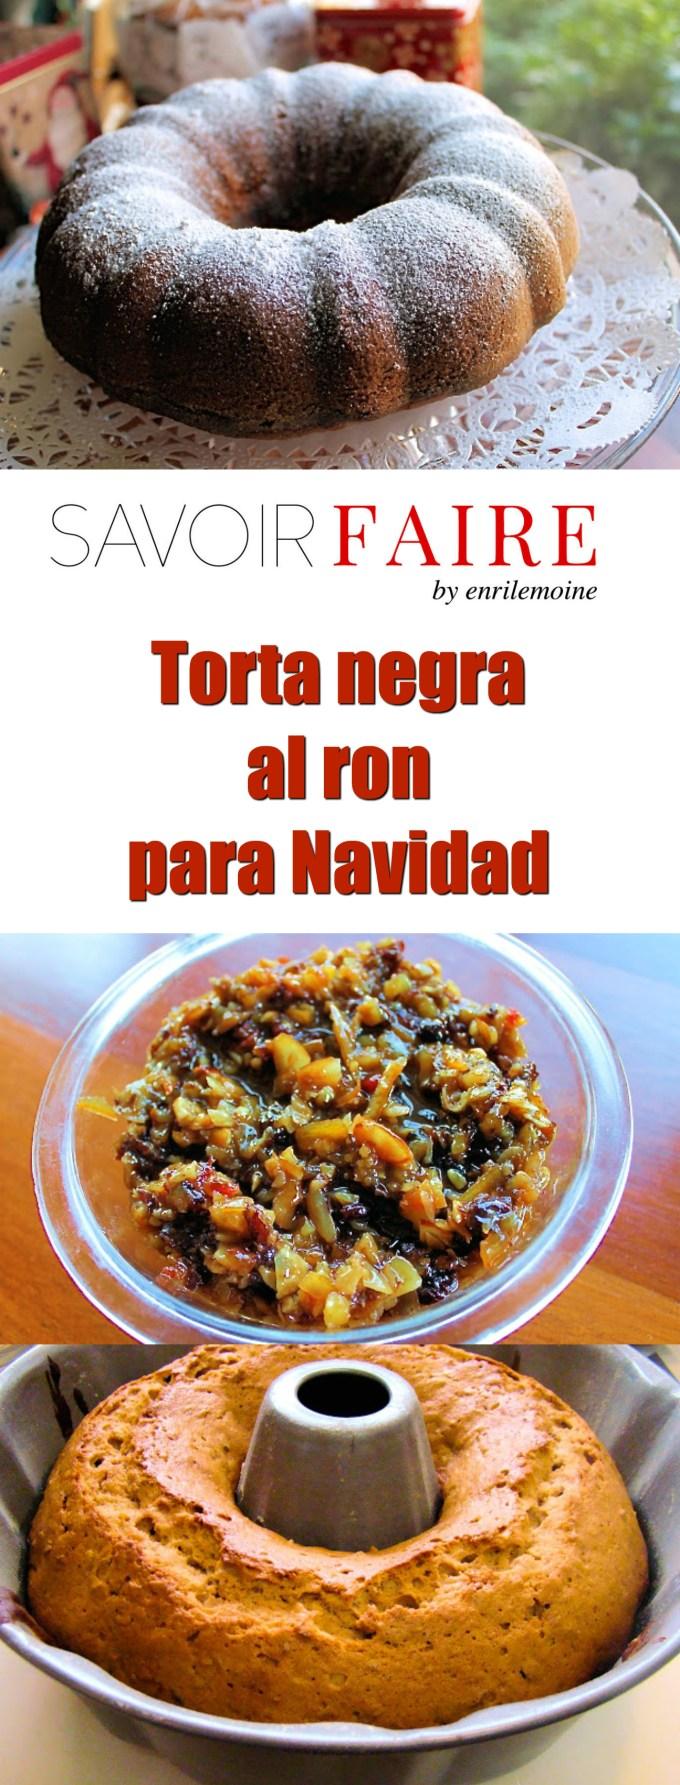 Torta negra al ron para Navidad - SAVOIR FAIRE by enrilemoine